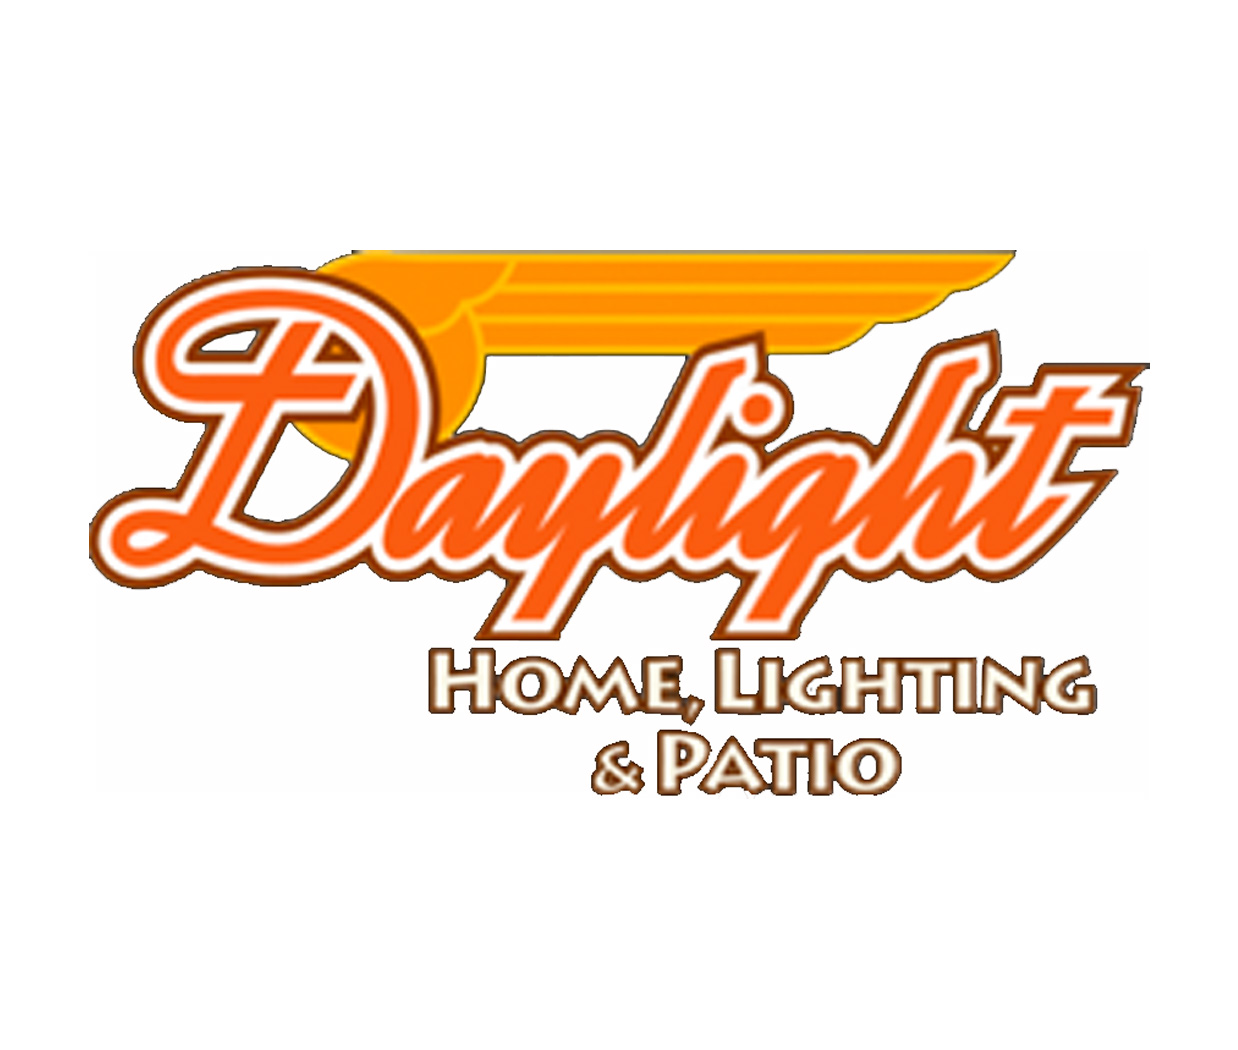 daylight home